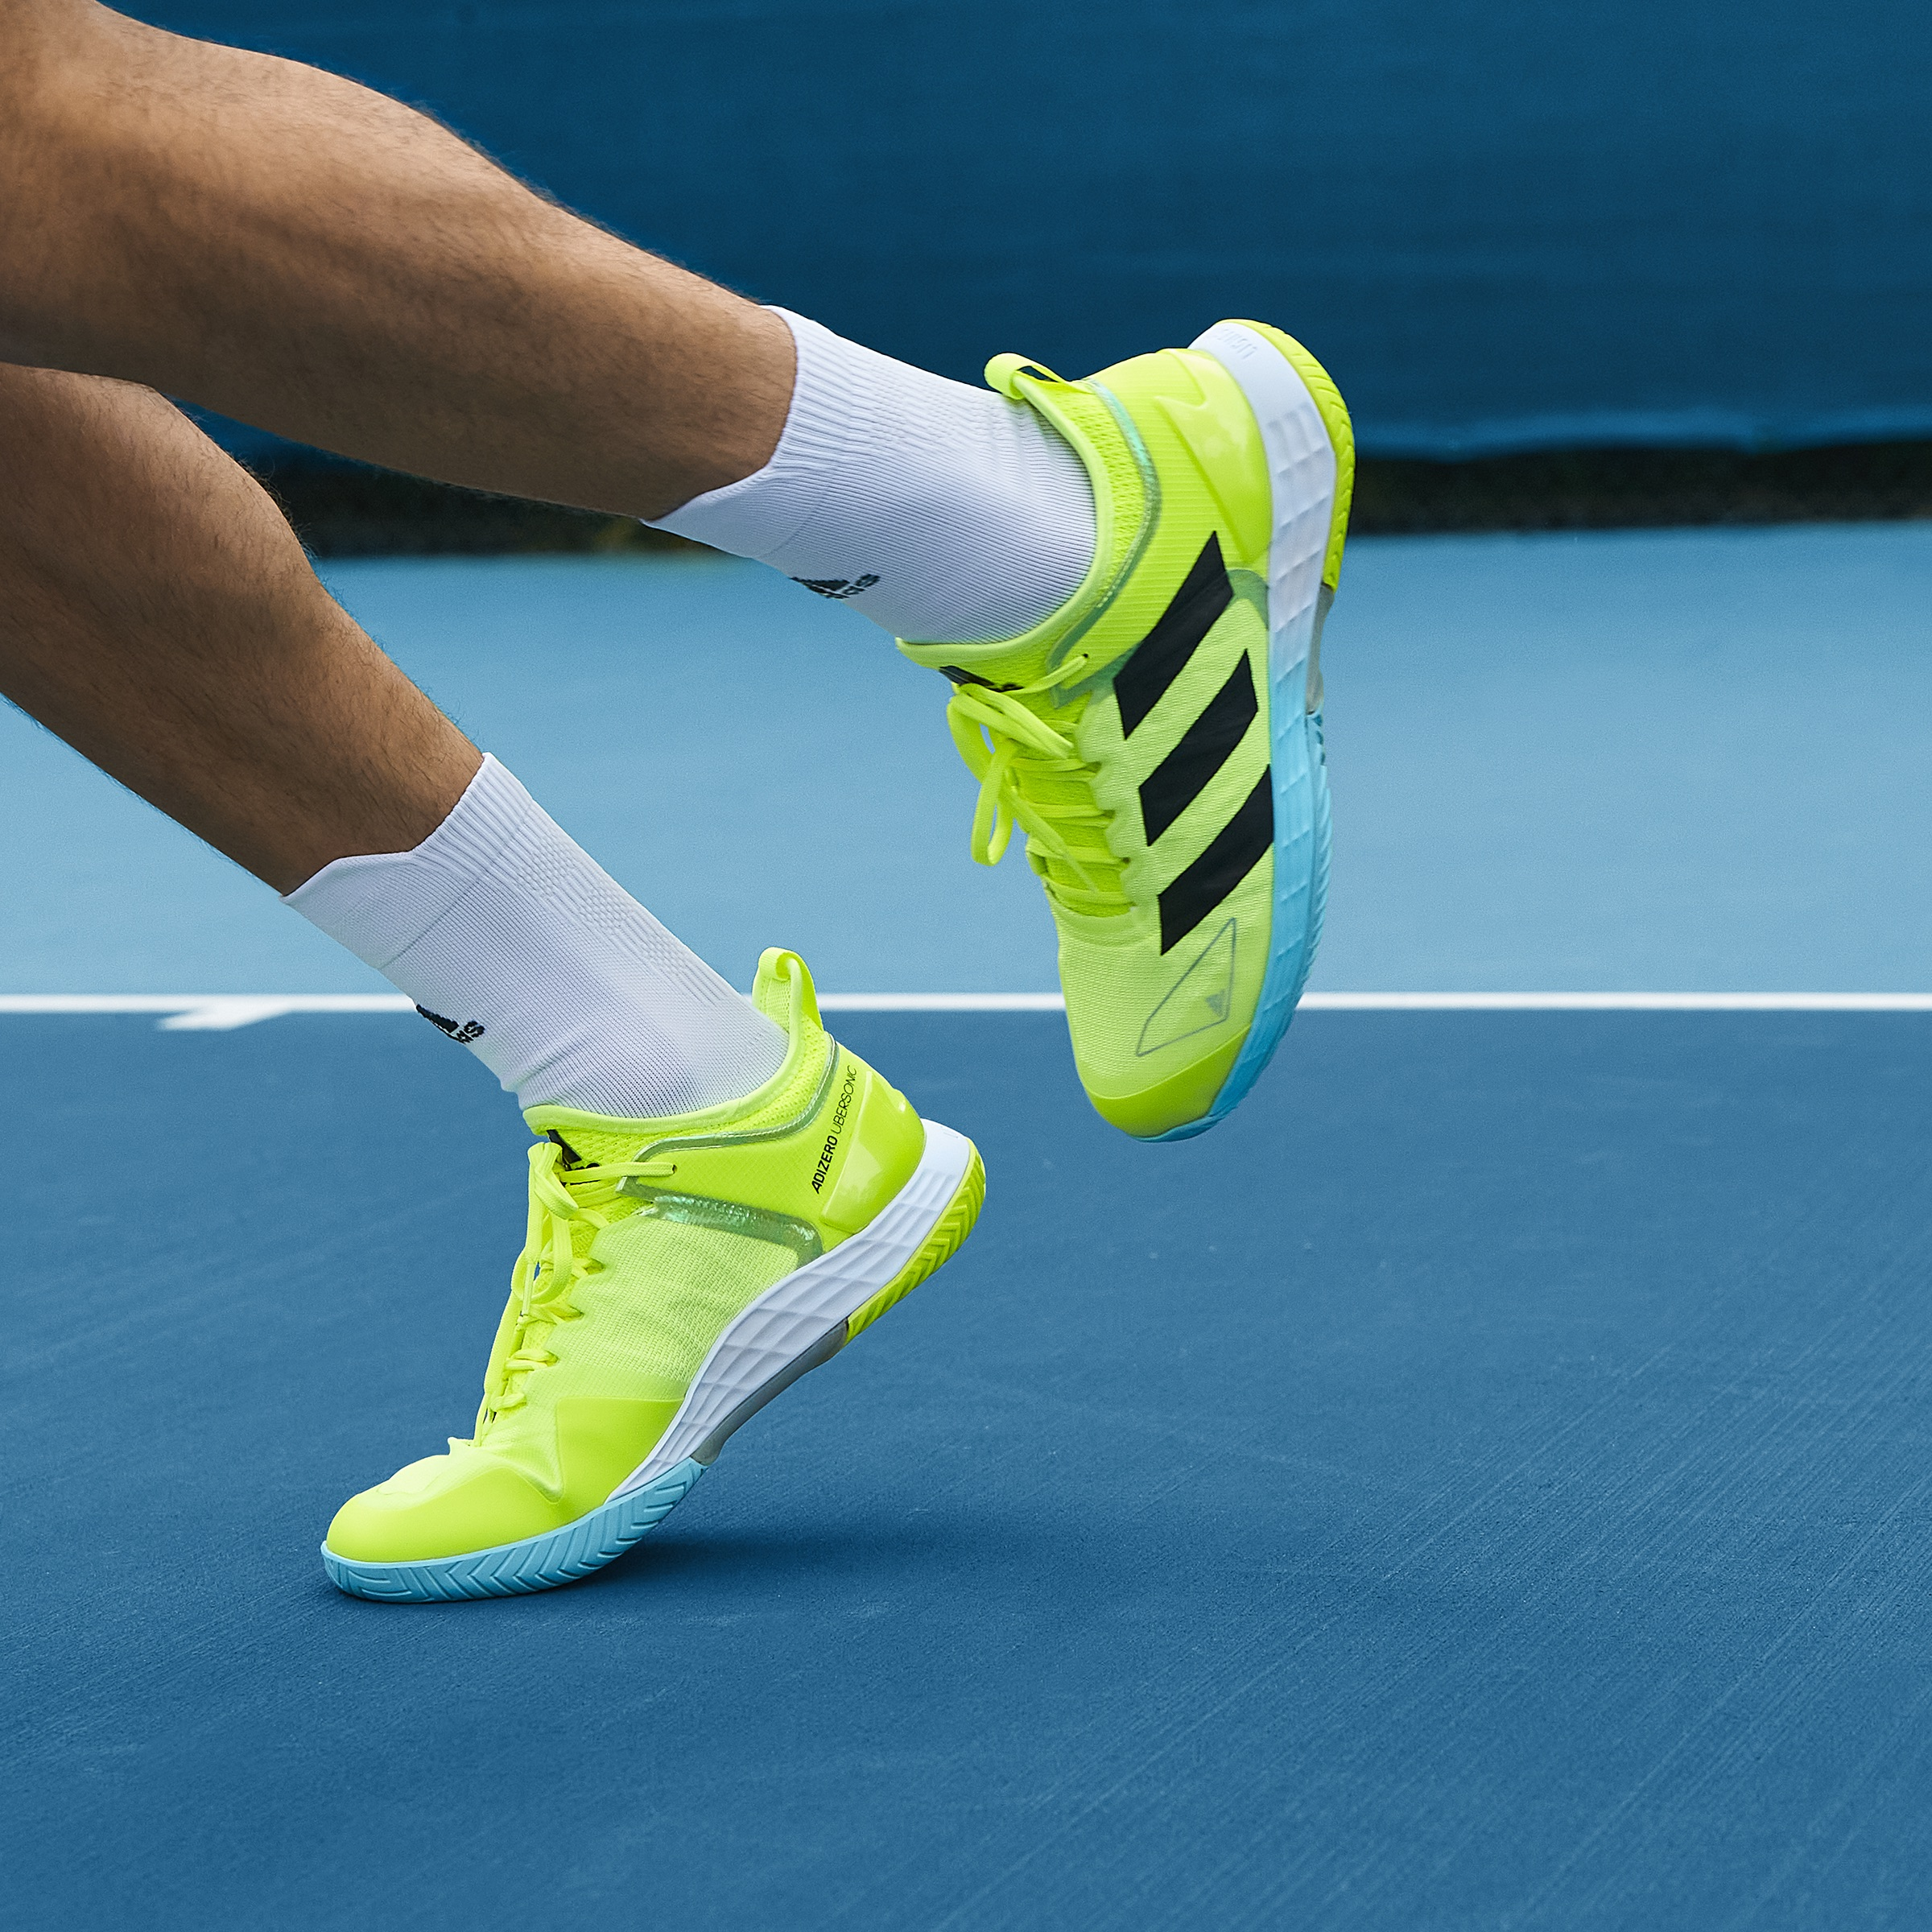 The Best Tennis Shoes 2021: Nike, New Balance, Adidas, K-SWISS ...